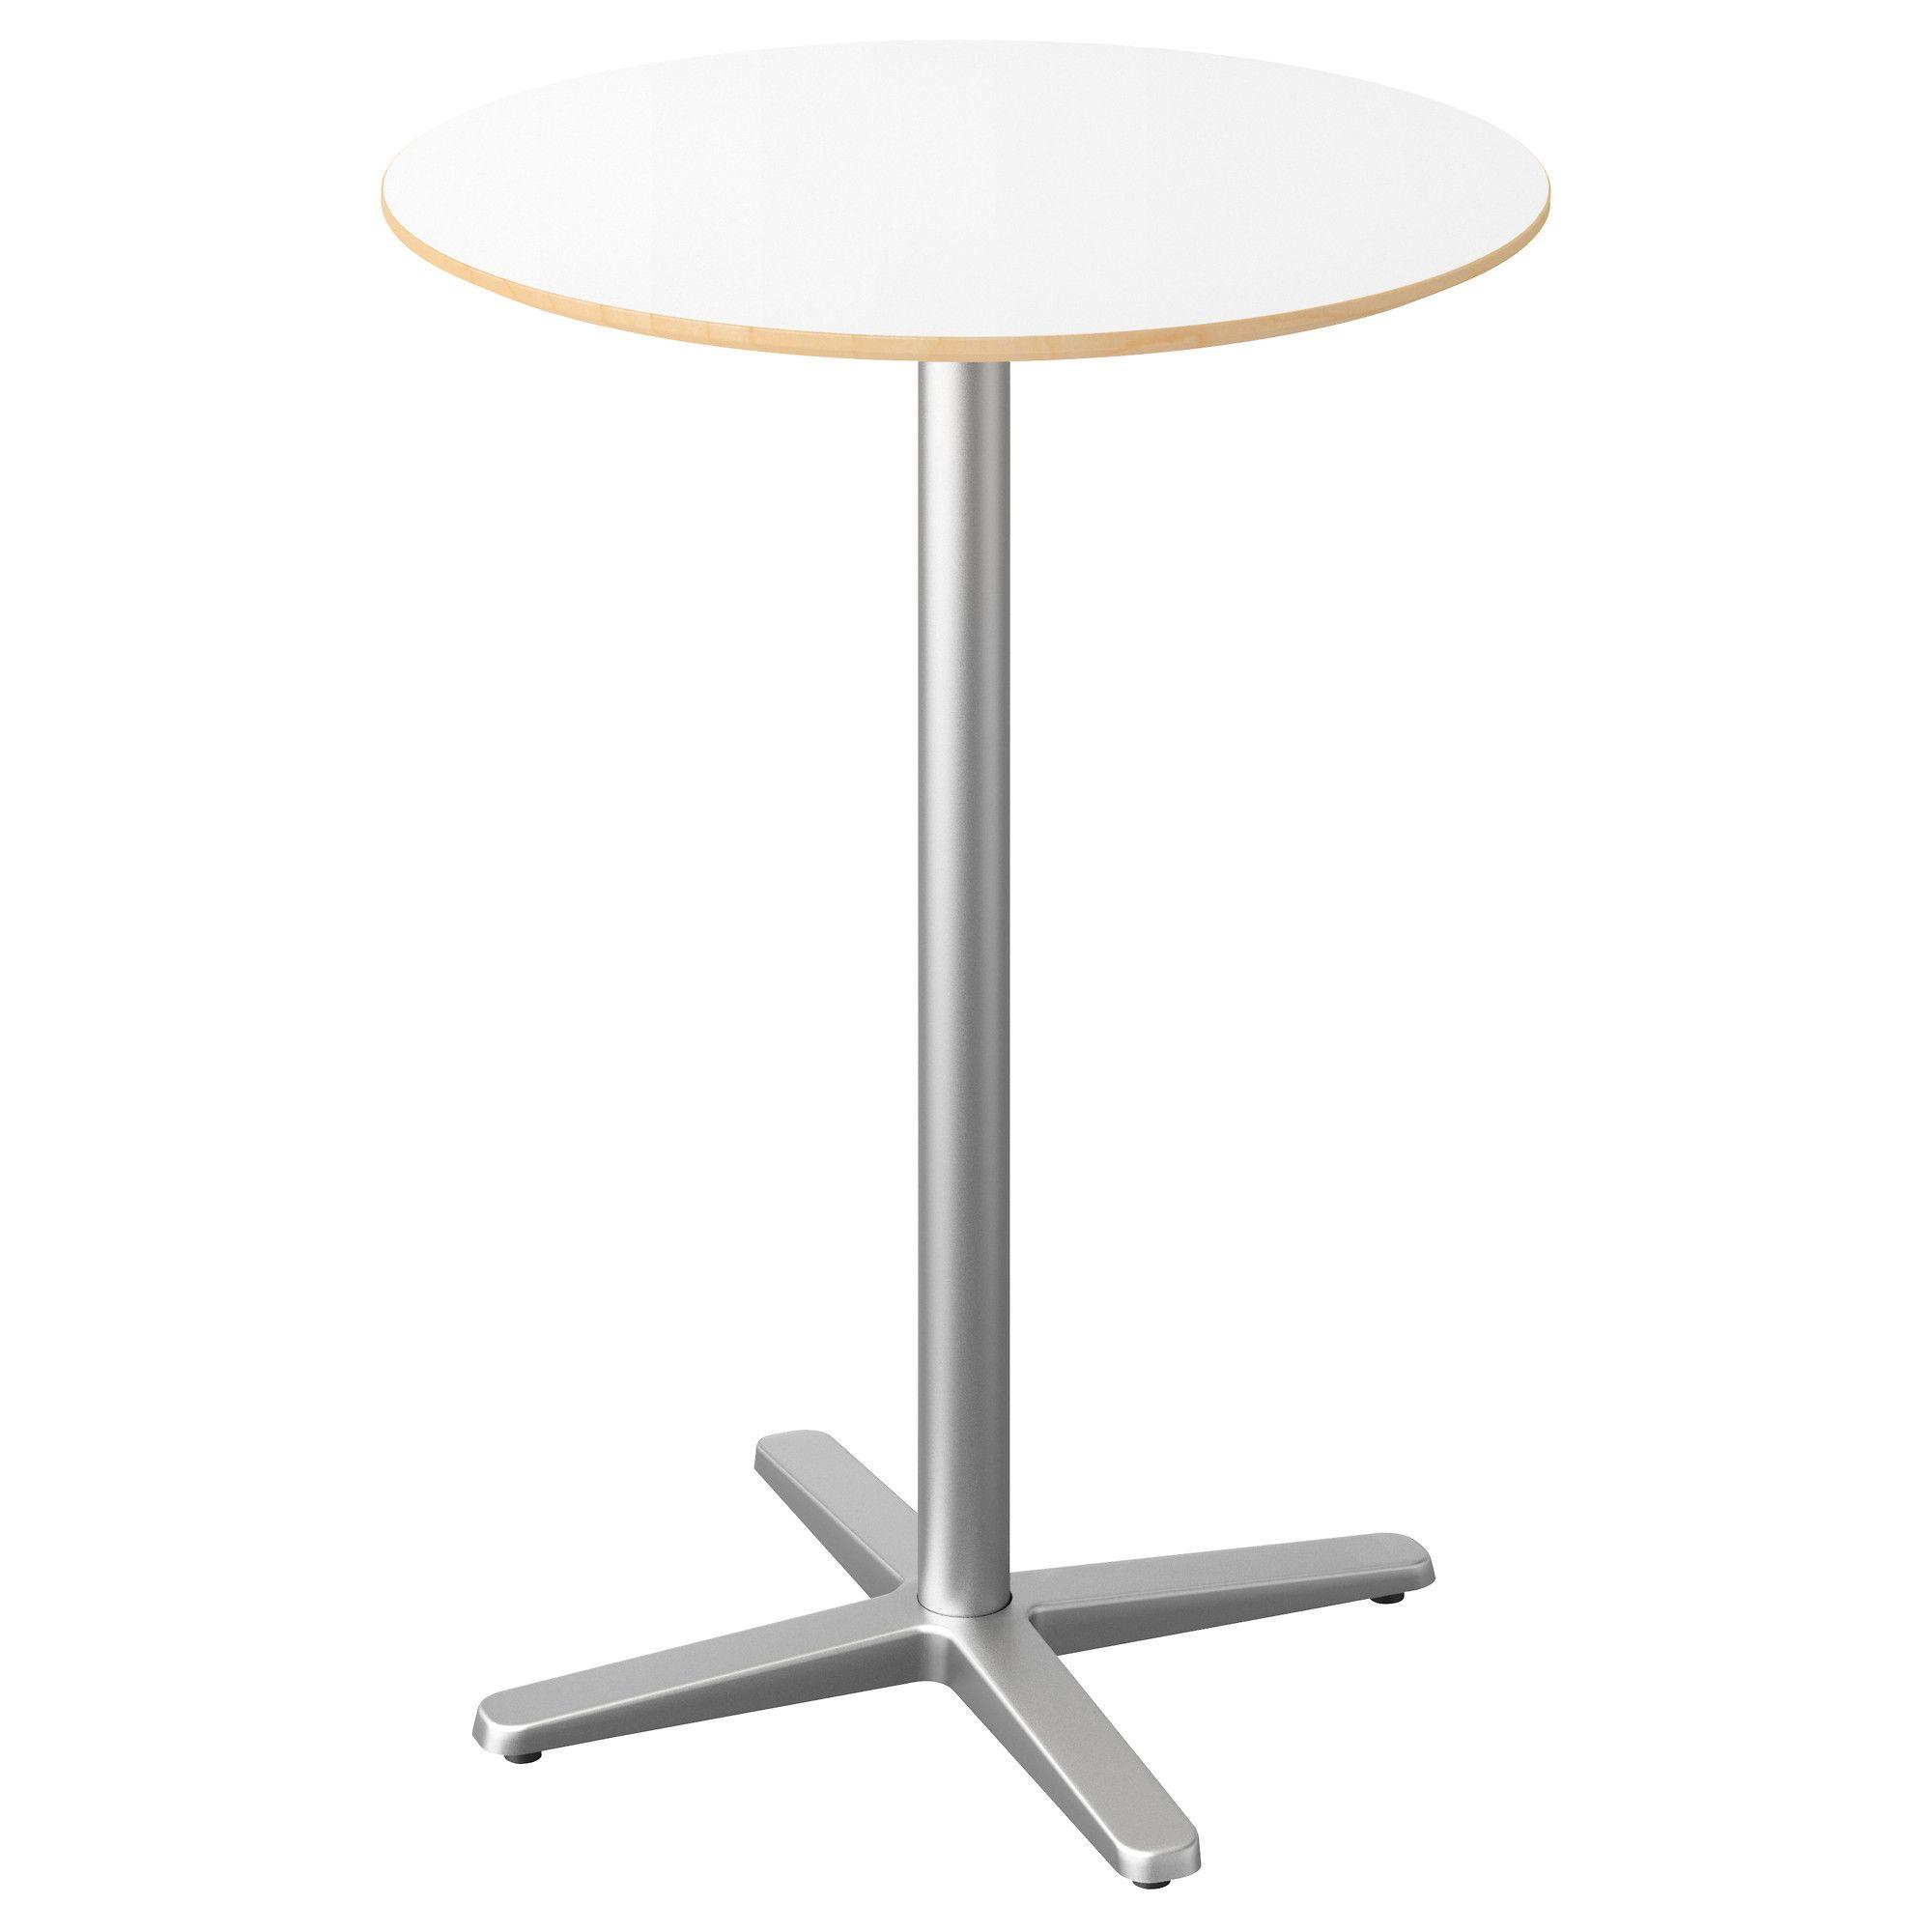 Ikea Us Furniture And Home Furnishings Bar Table Ikea Ikea